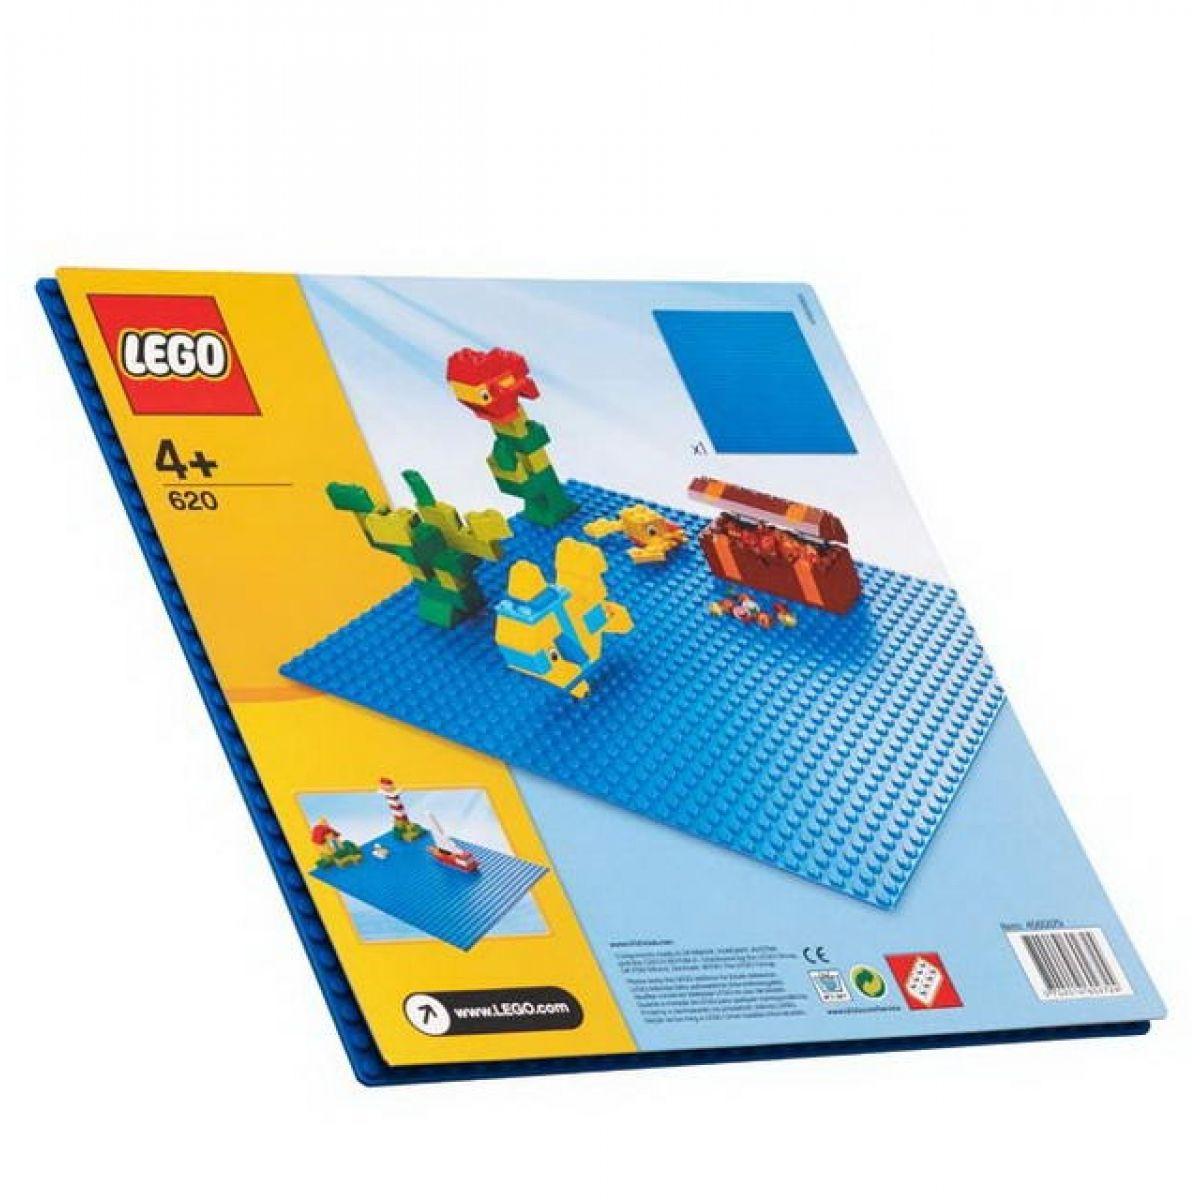 LEGO Creator 0620 Modrá podložka